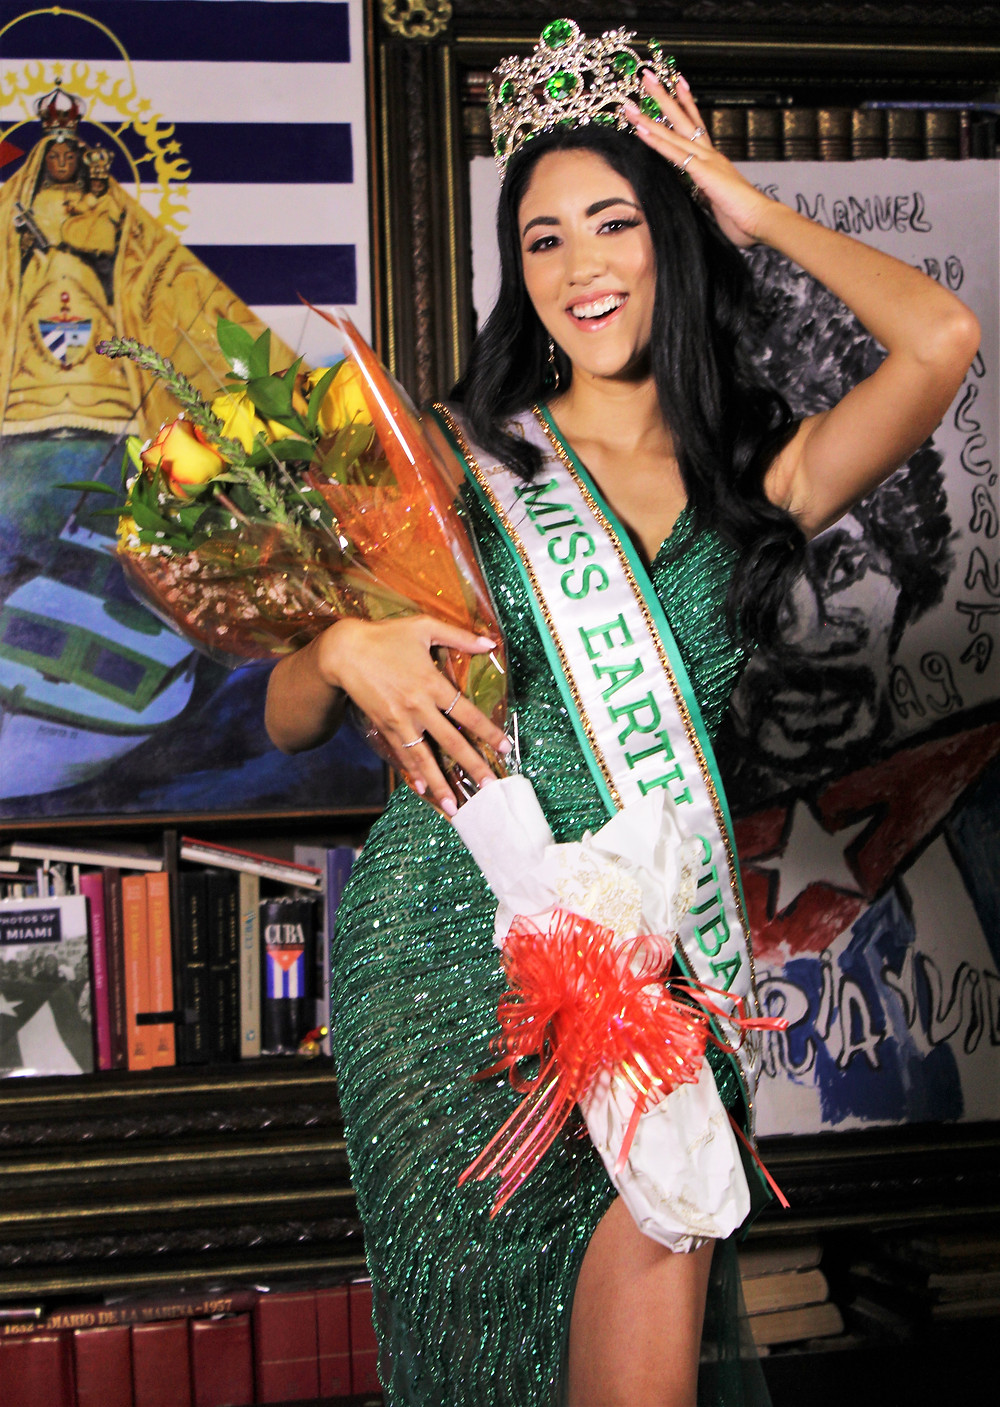 Cynthia Linnet Lau crowned as Miss Earth Cuba 2021